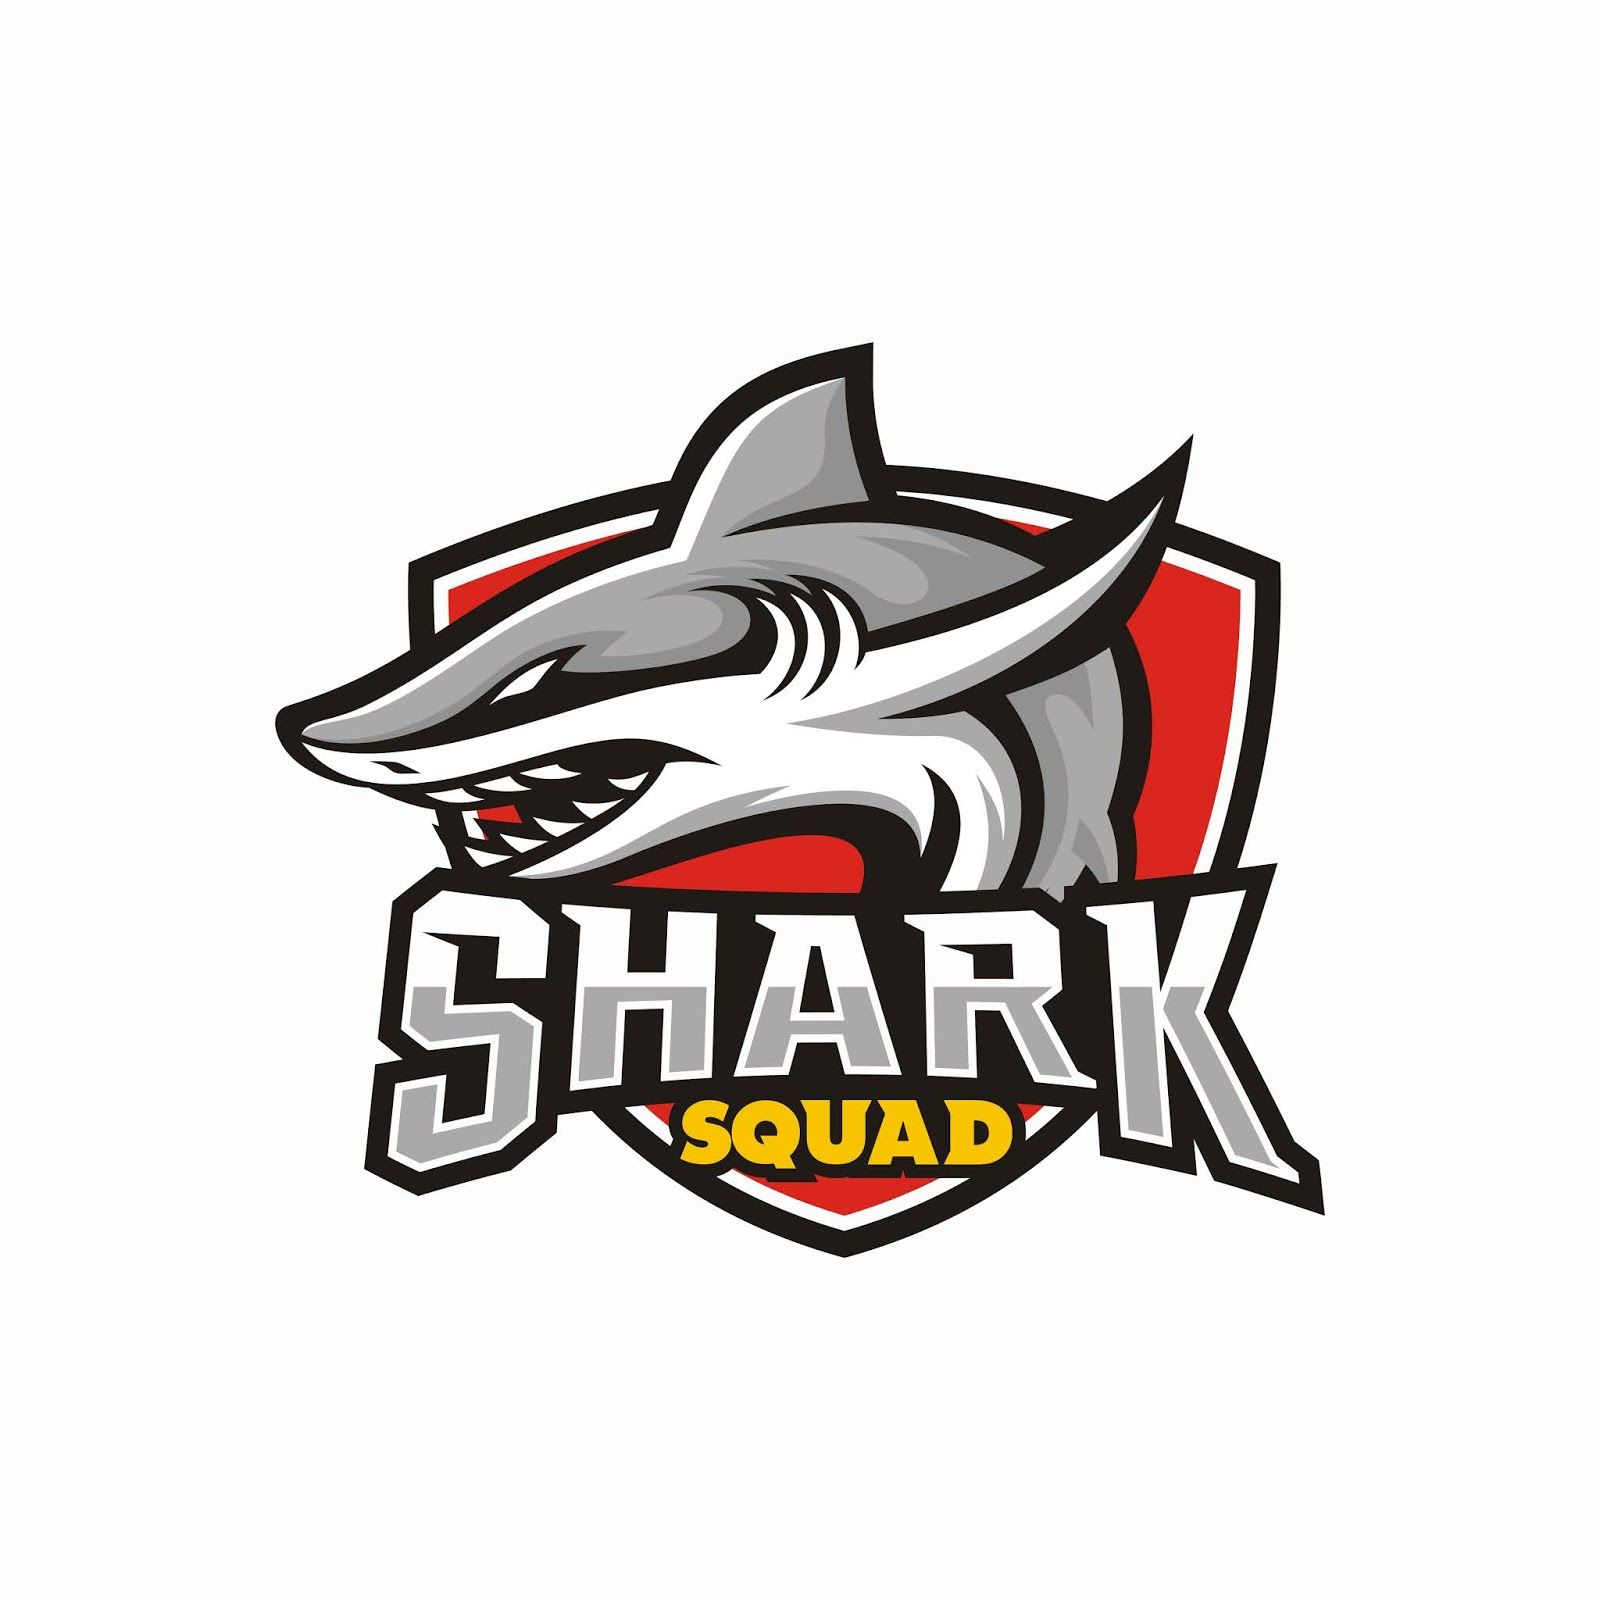 Shark Esport Gaming Mascot Shark Mascot Vector Logo